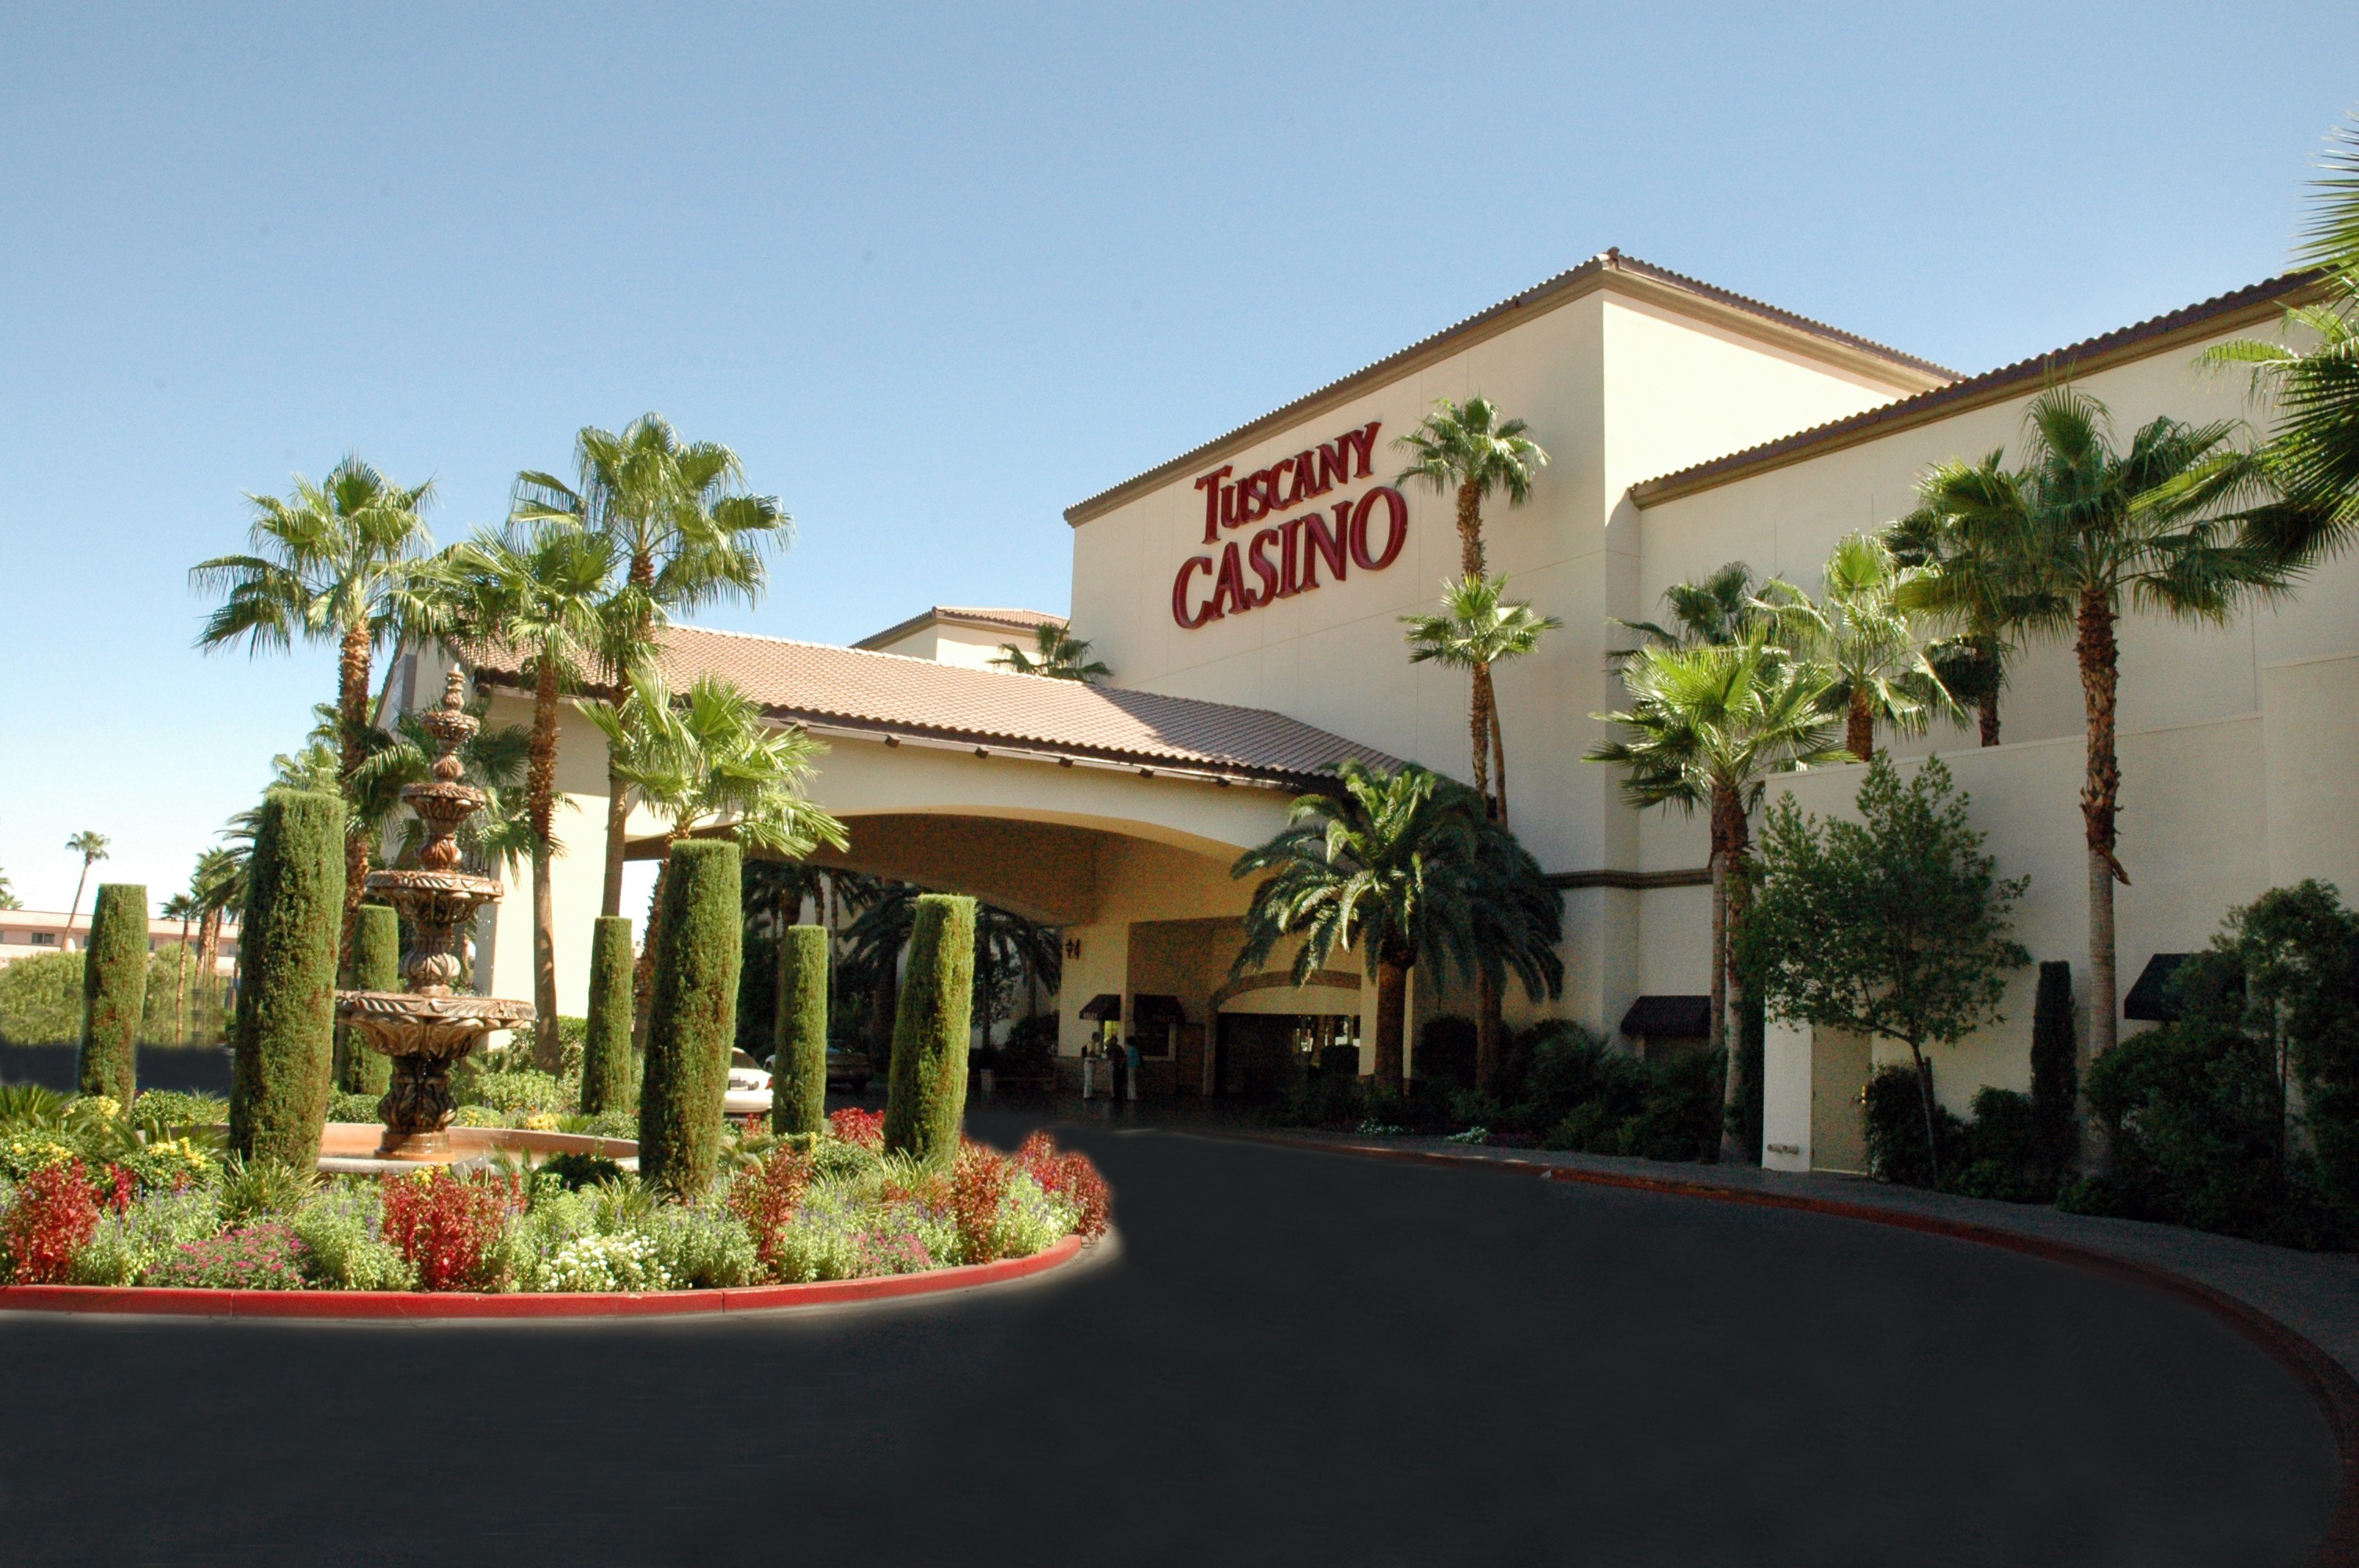 Tuscany las vegas hotel casino royal caribbean grandeur of the seas casino